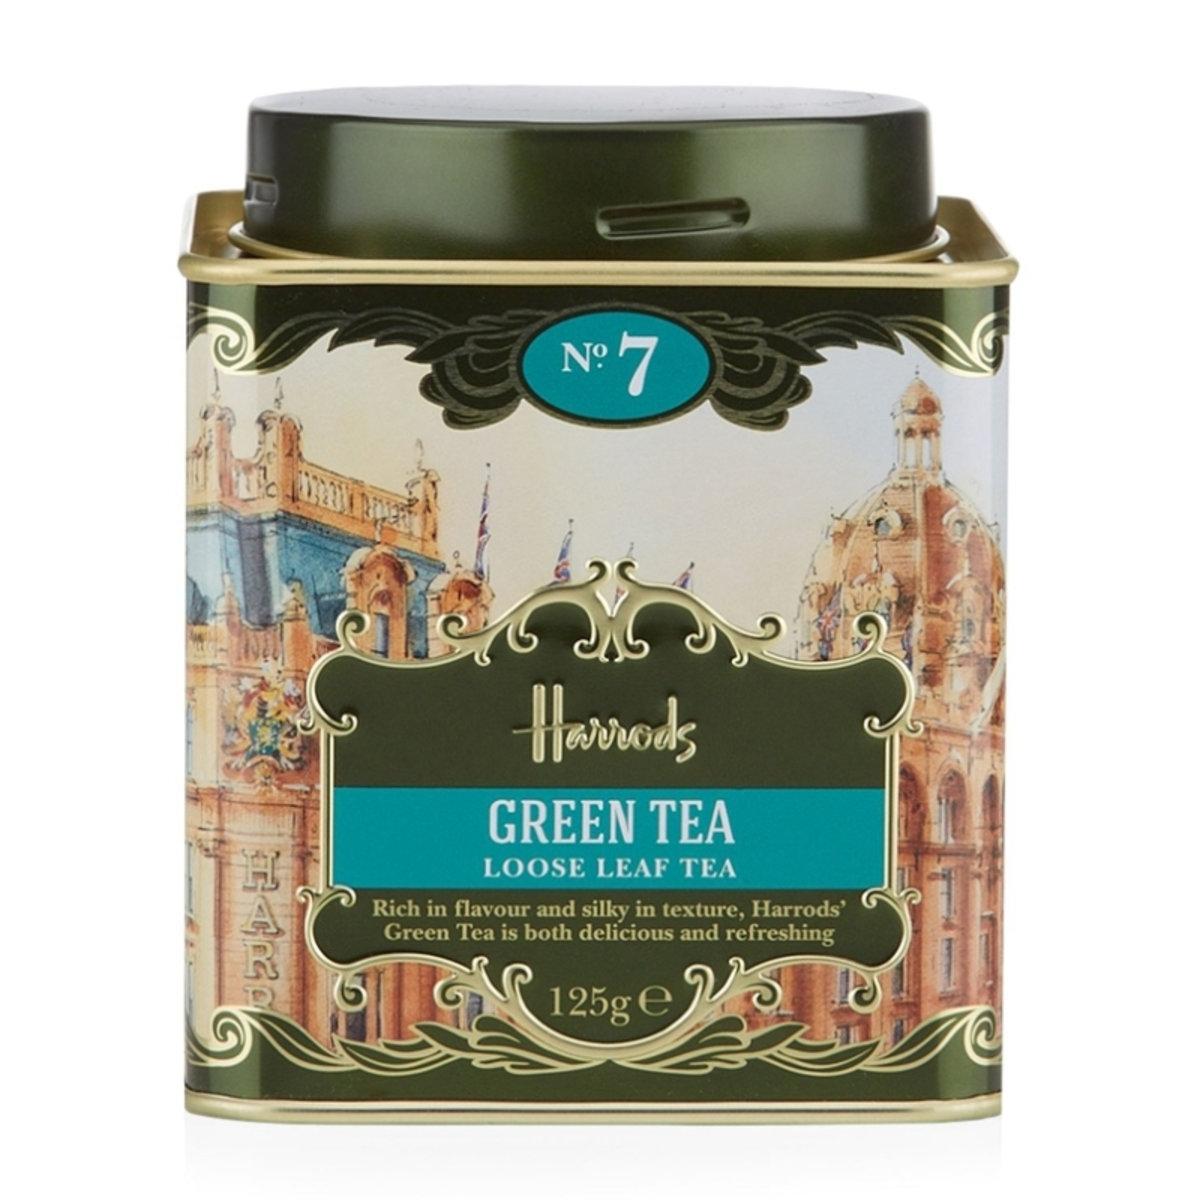 Heritage No. 7 Green Loose Leaf Tea -125g (Parallel Import goods)